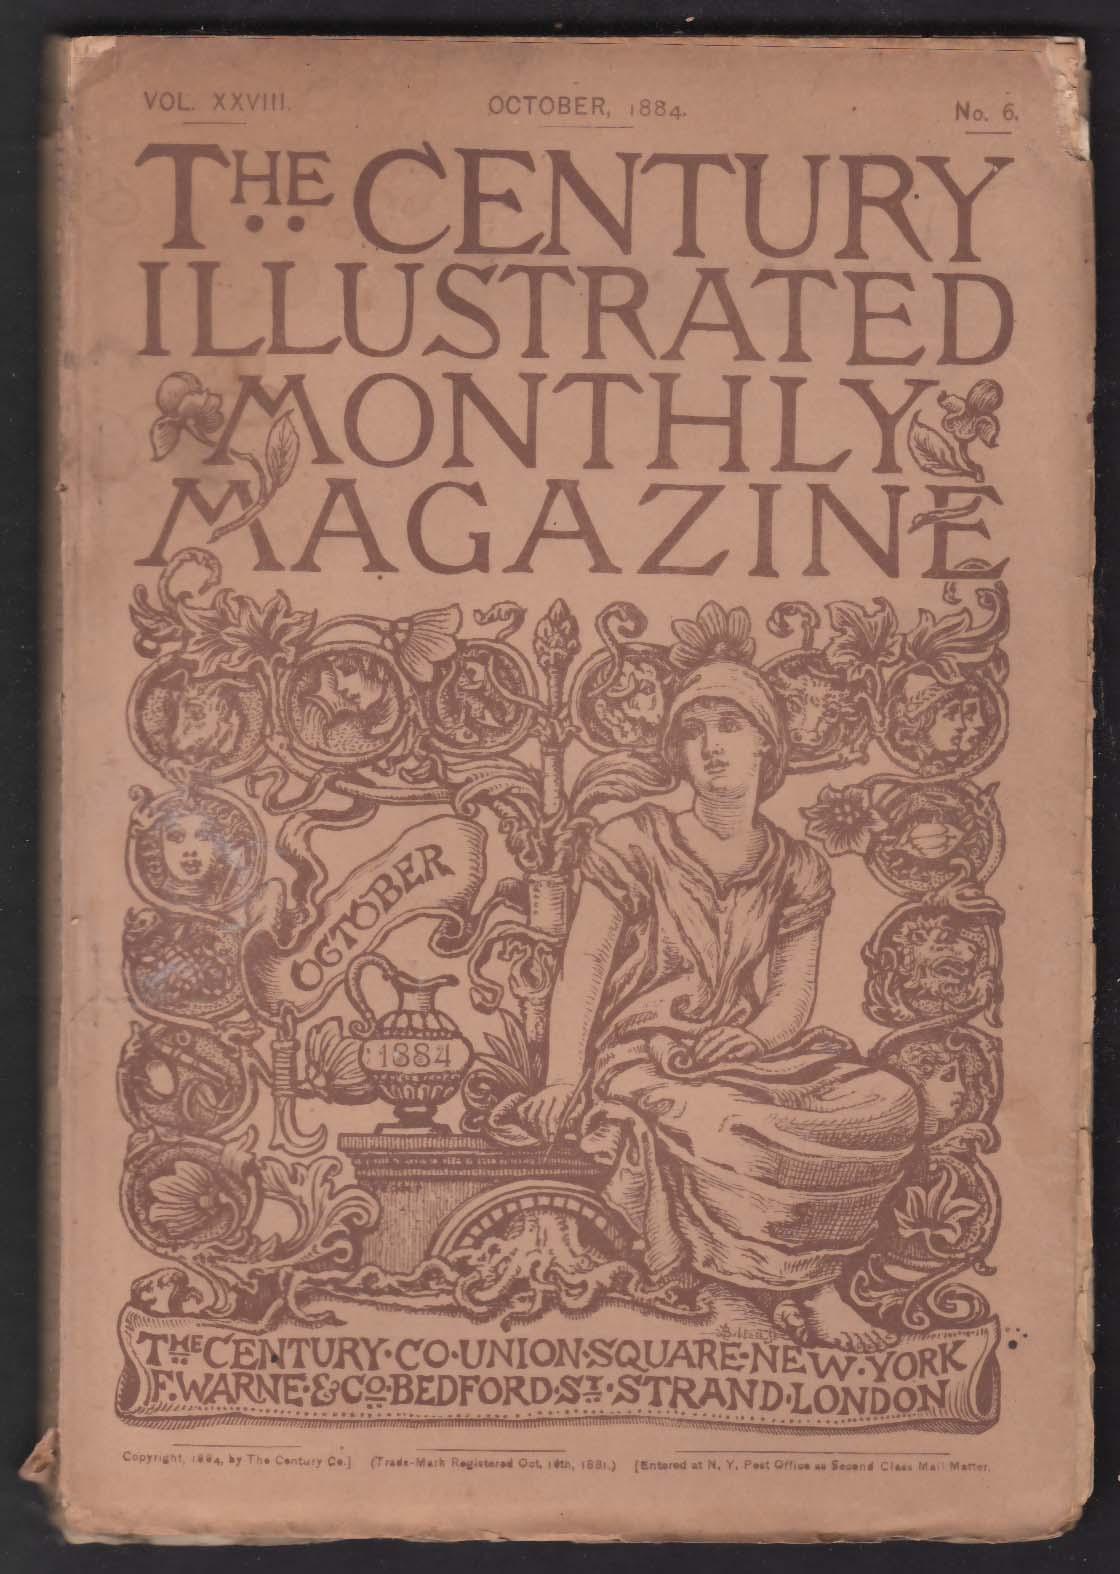 CENTURY ILLUSTRATED MONTHLY Rosa Bonheur Auston Dobson S P Langley ++ 10 1884